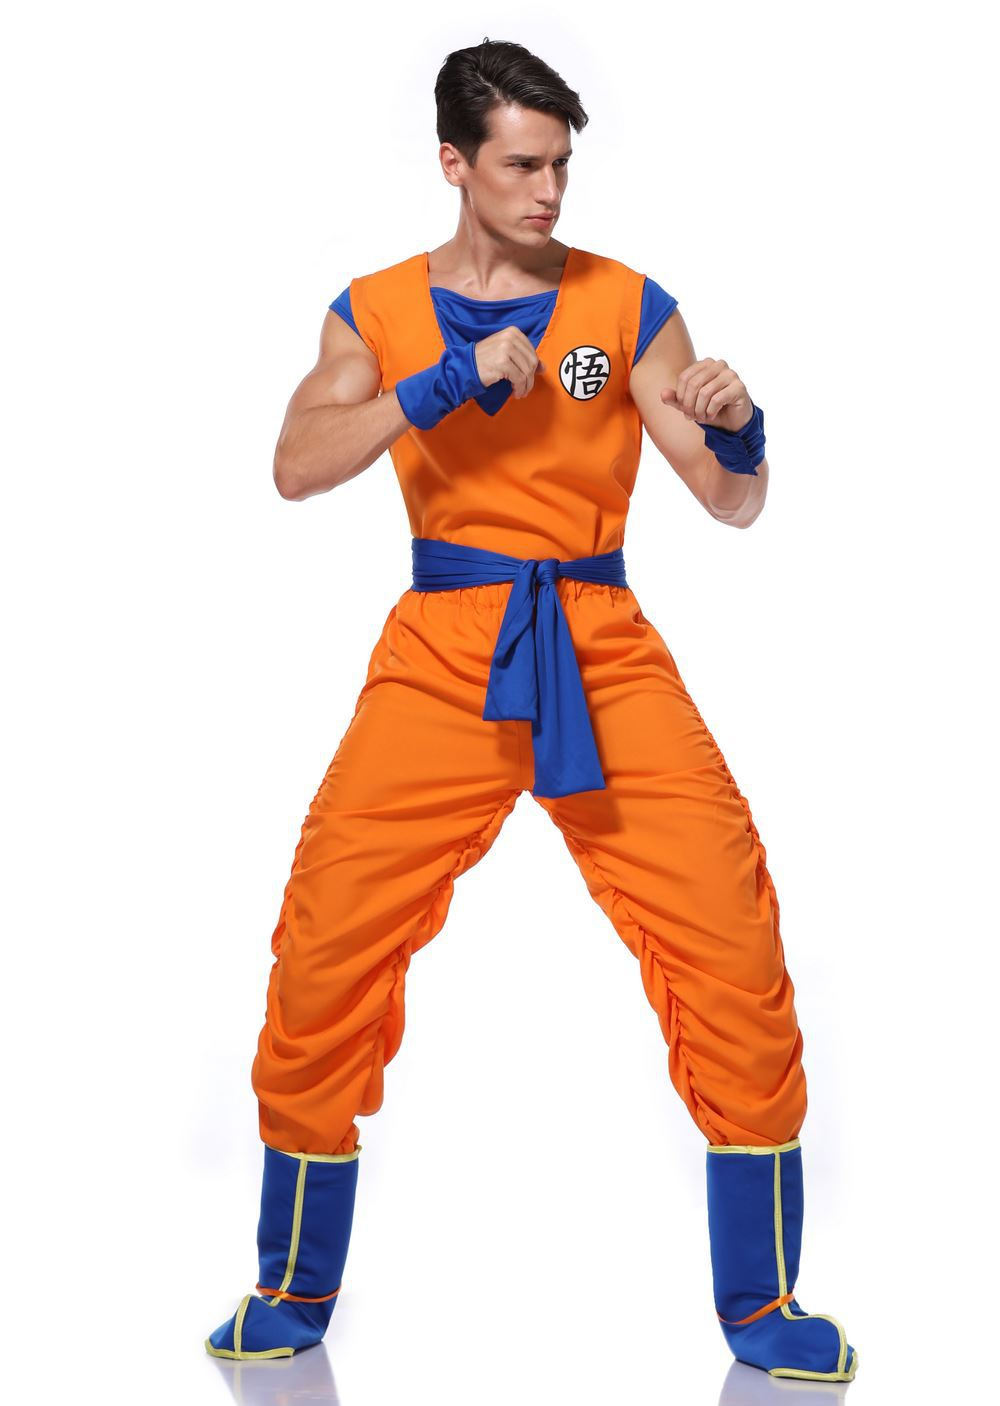 Dragon ball z goku traje Anime Dragon Ball Son Goku Cosplay trajes uniformes ropa de alta calidad para adultos hall